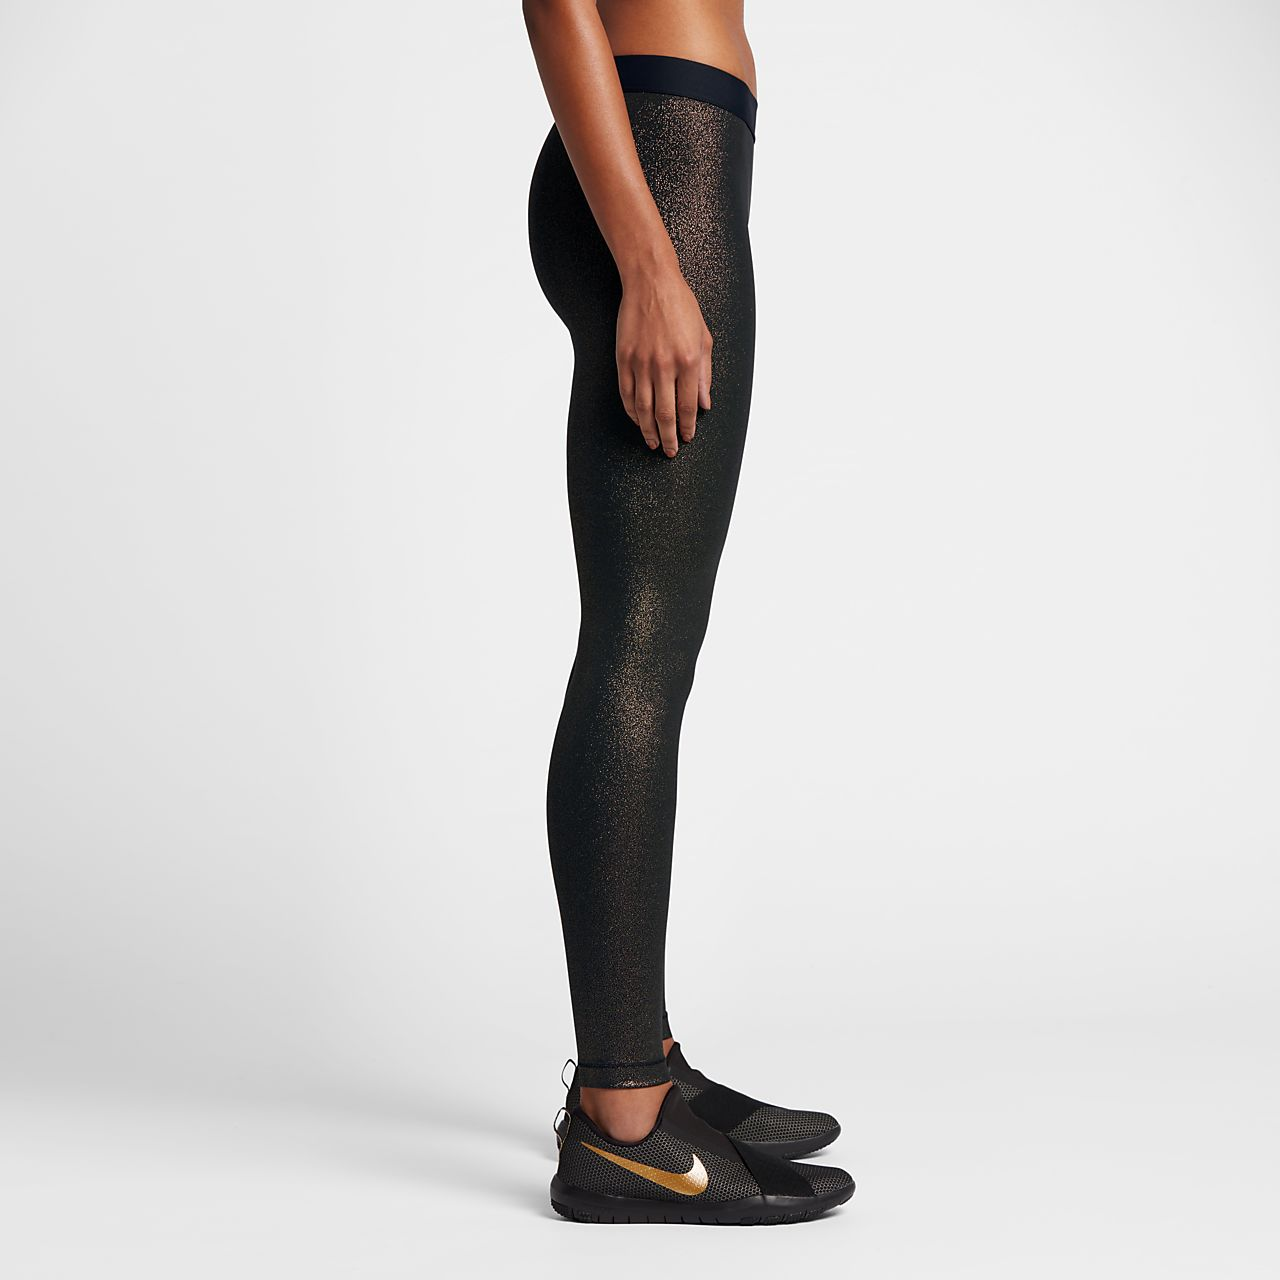 nike pro sparkle women 39 s training tights ca. Black Bedroom Furniture Sets. Home Design Ideas